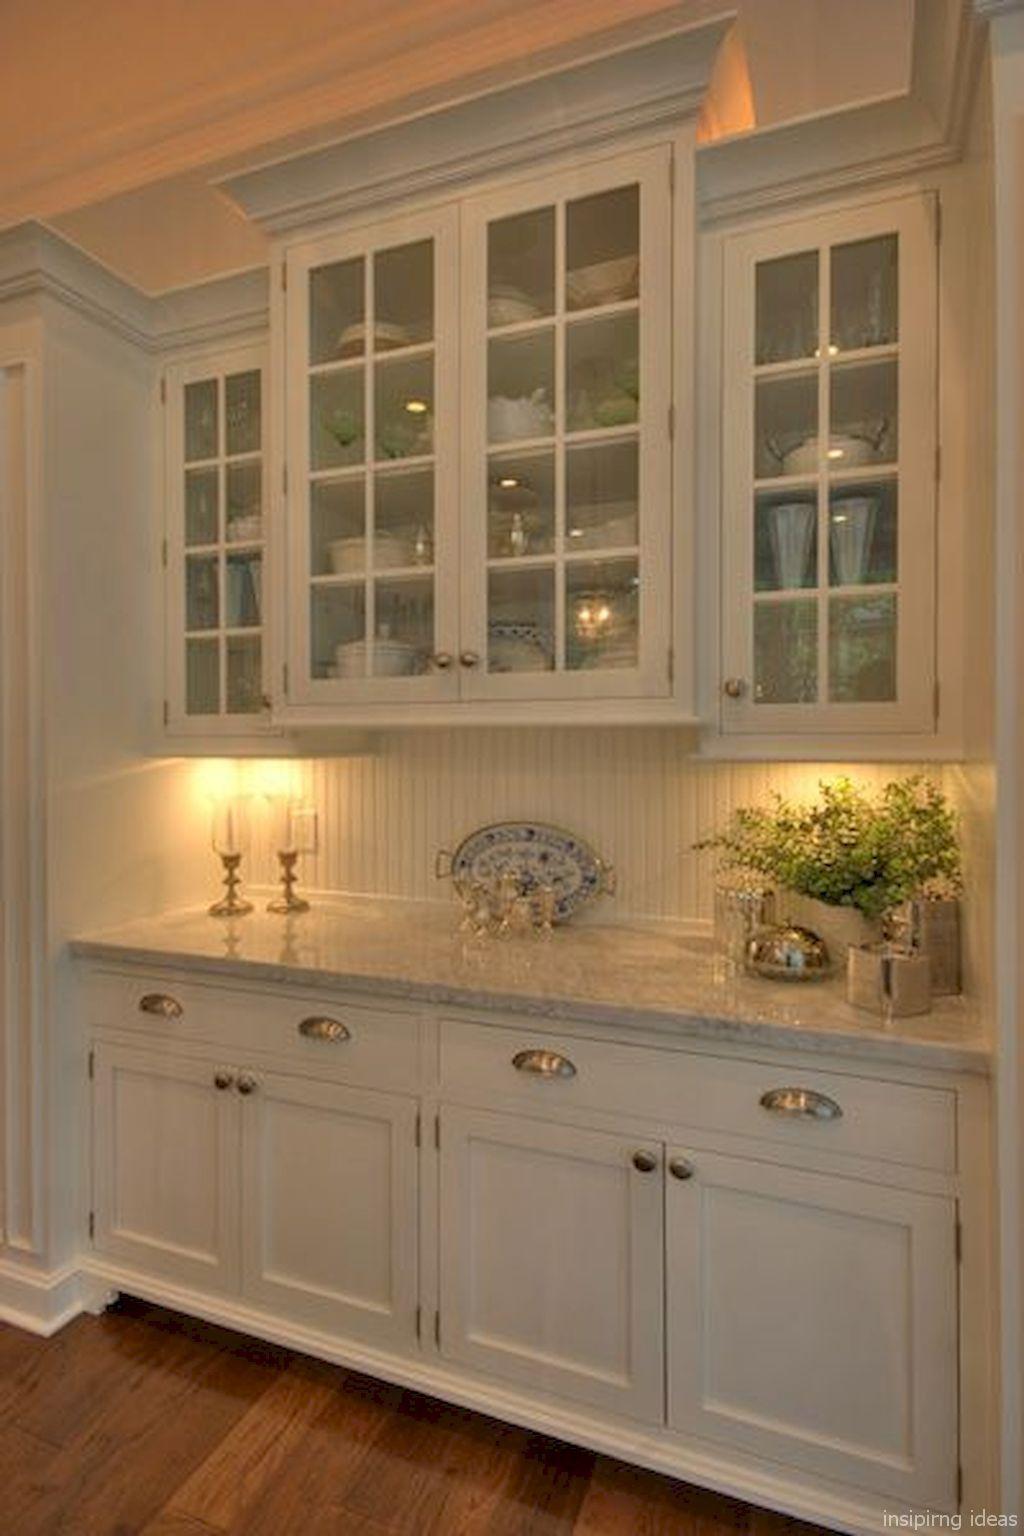 Incredible Farmhouse Kitchen Cabinets Design Ideas 51 Kitchen Cabinets Decor Kitchen Cabinetry Kitchen Cabinet Design